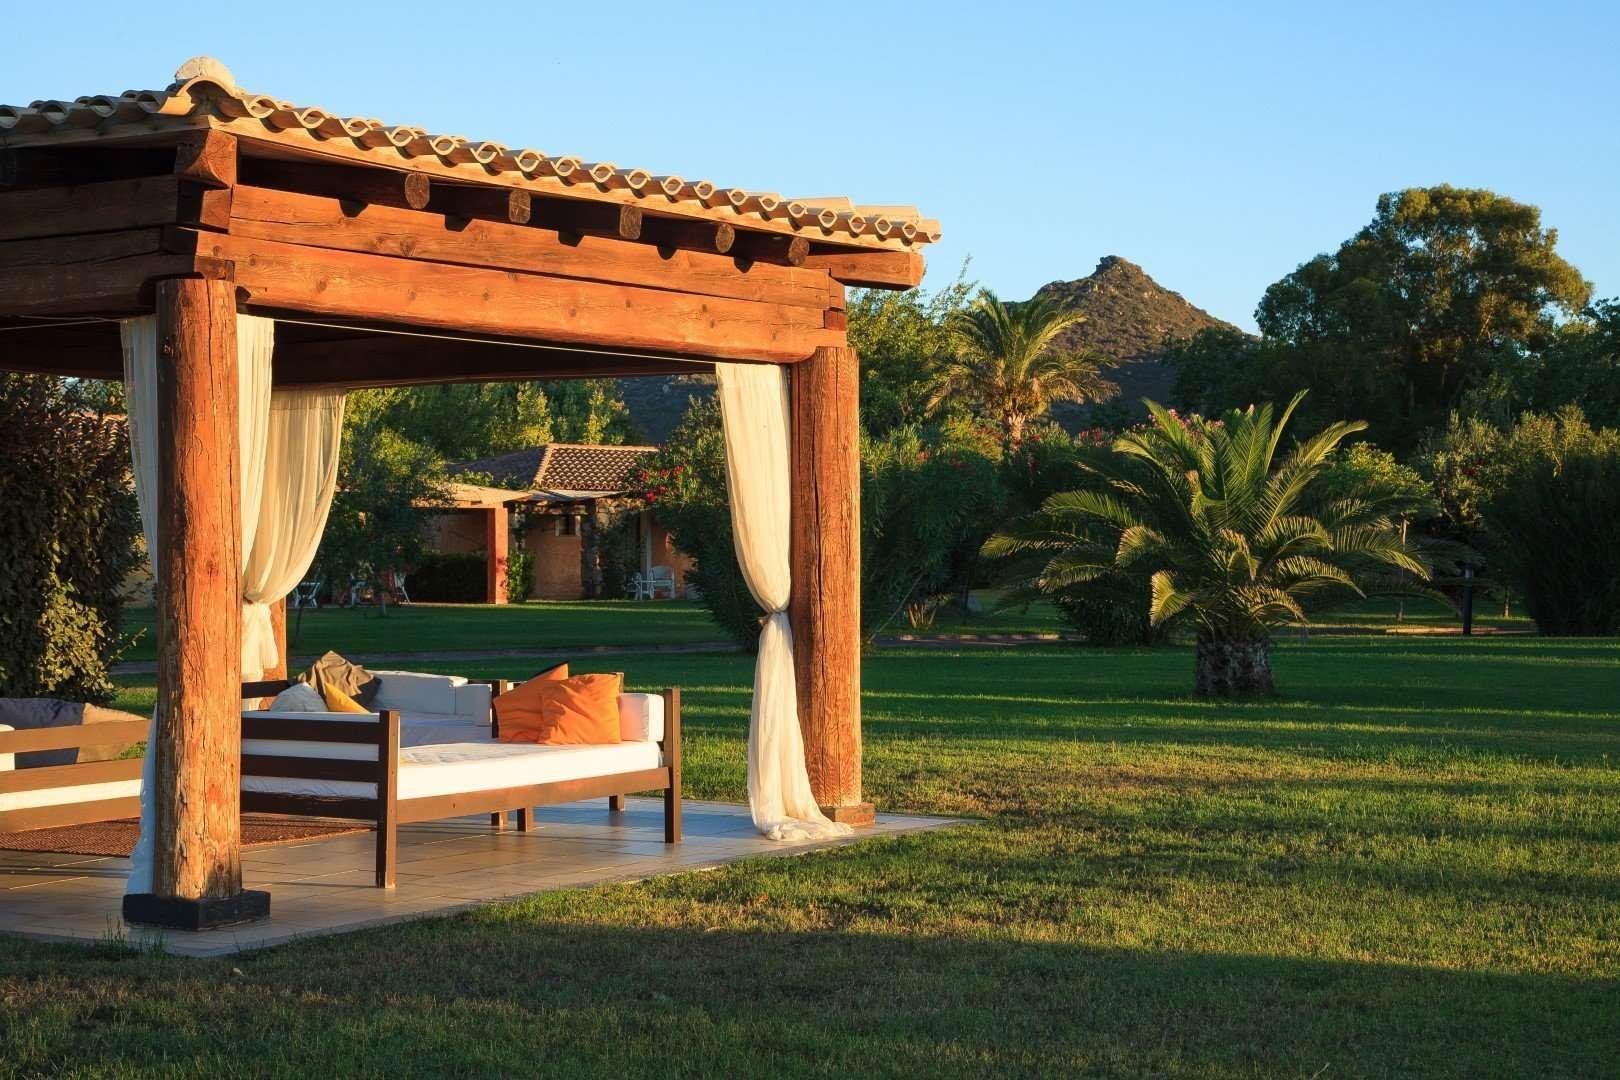 hotel garden beach - sardinie - relaxen in de tuin